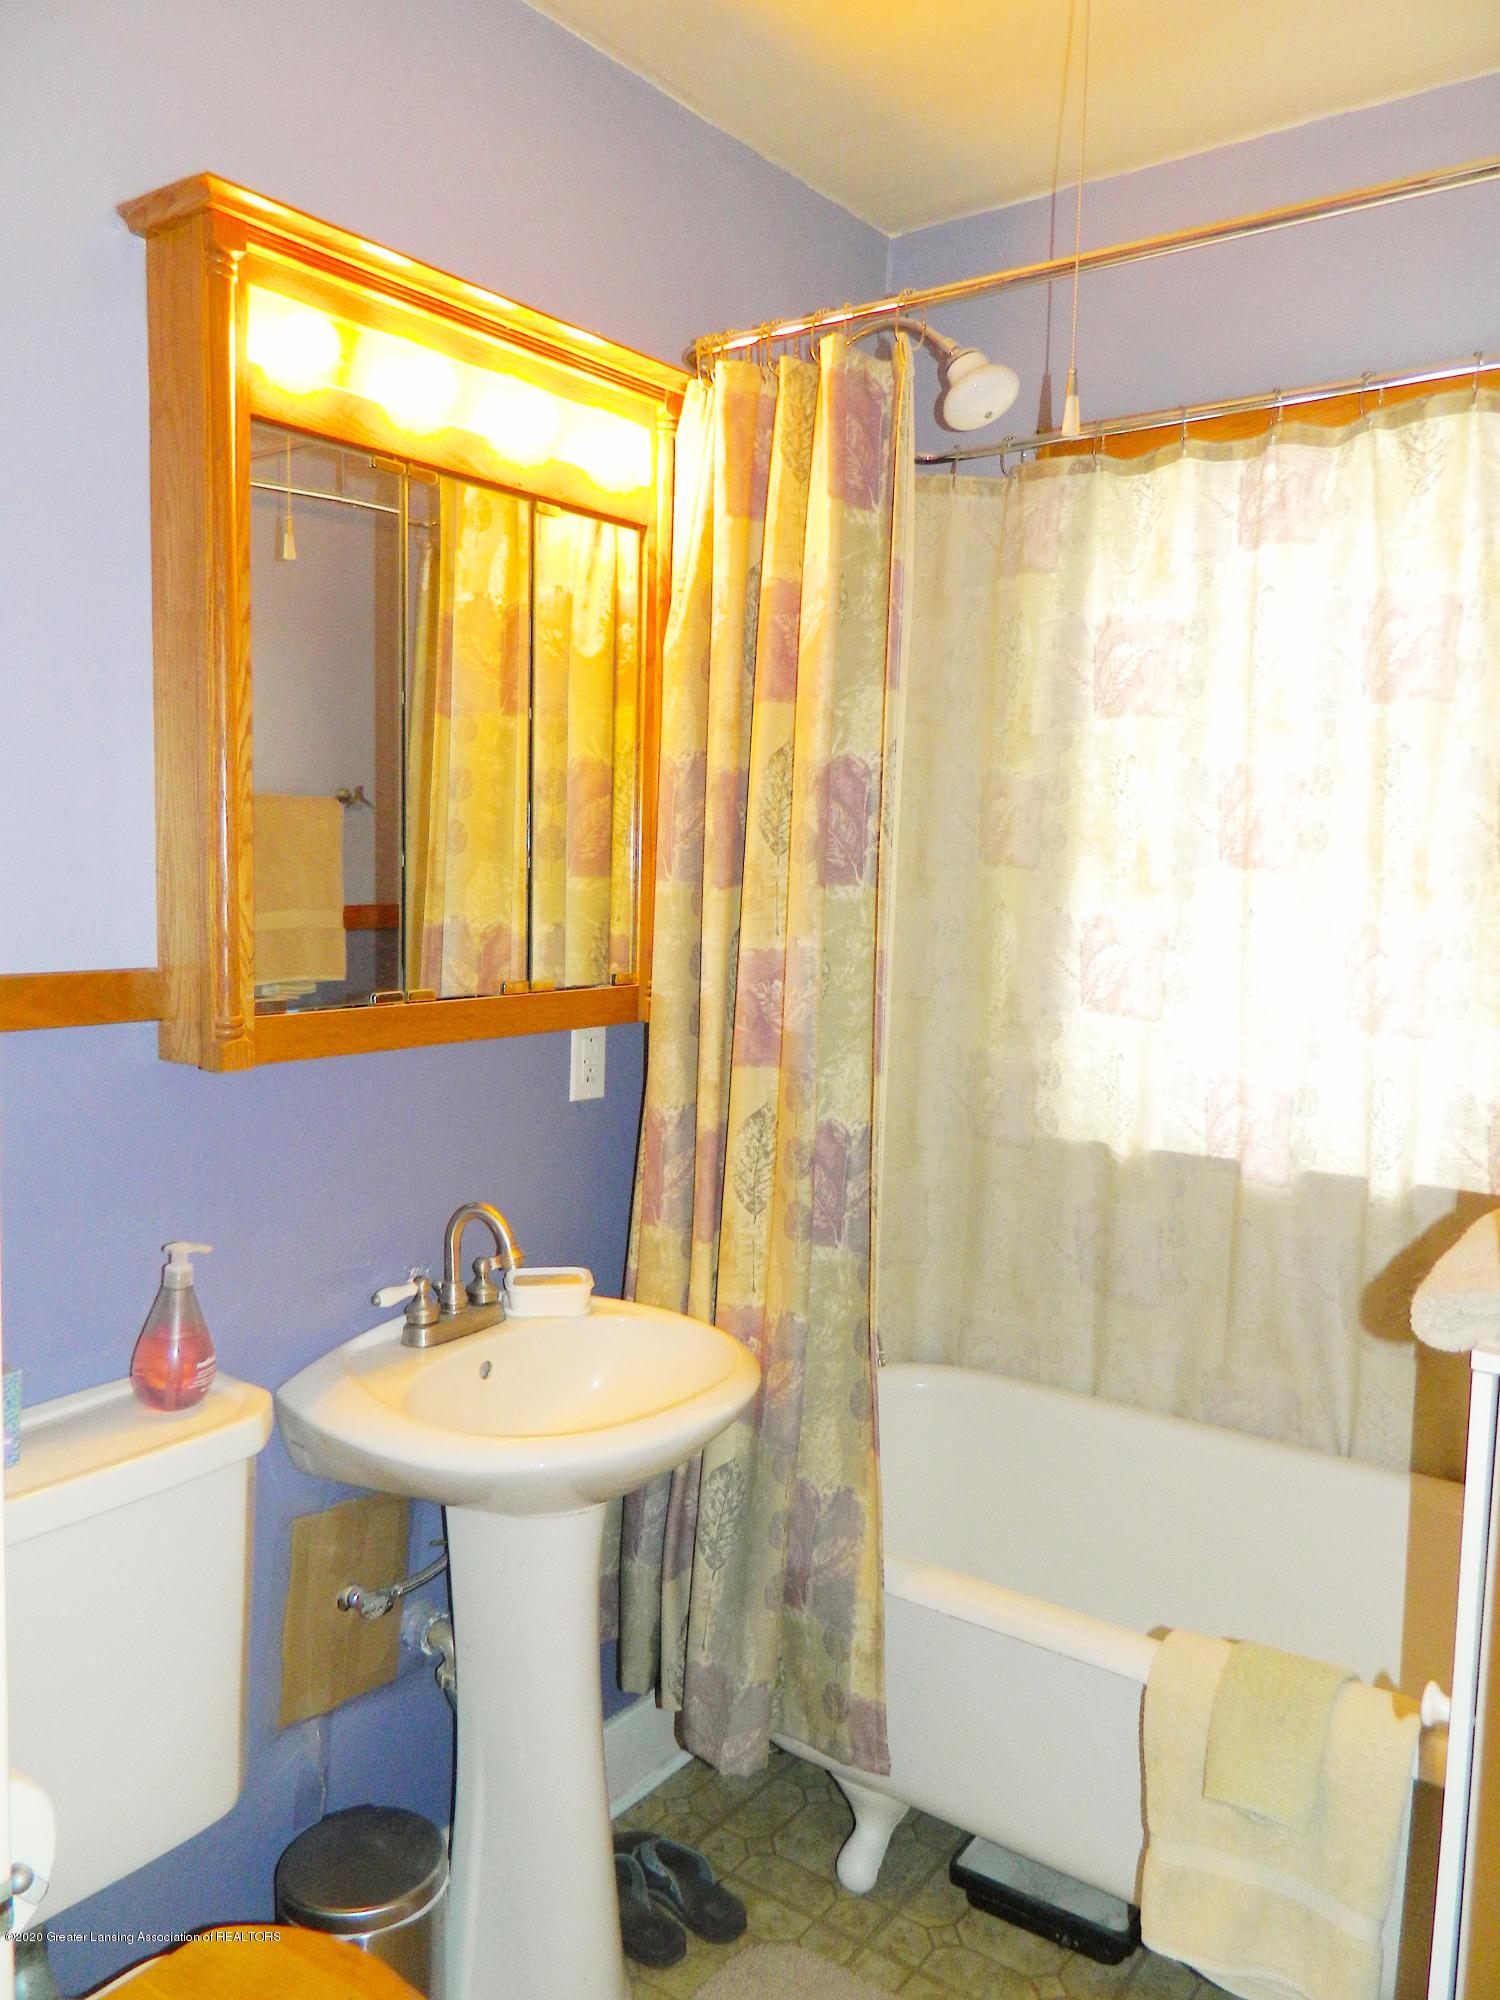 916 Dakin St - Bathroom_DAKIN 916 copy - 10